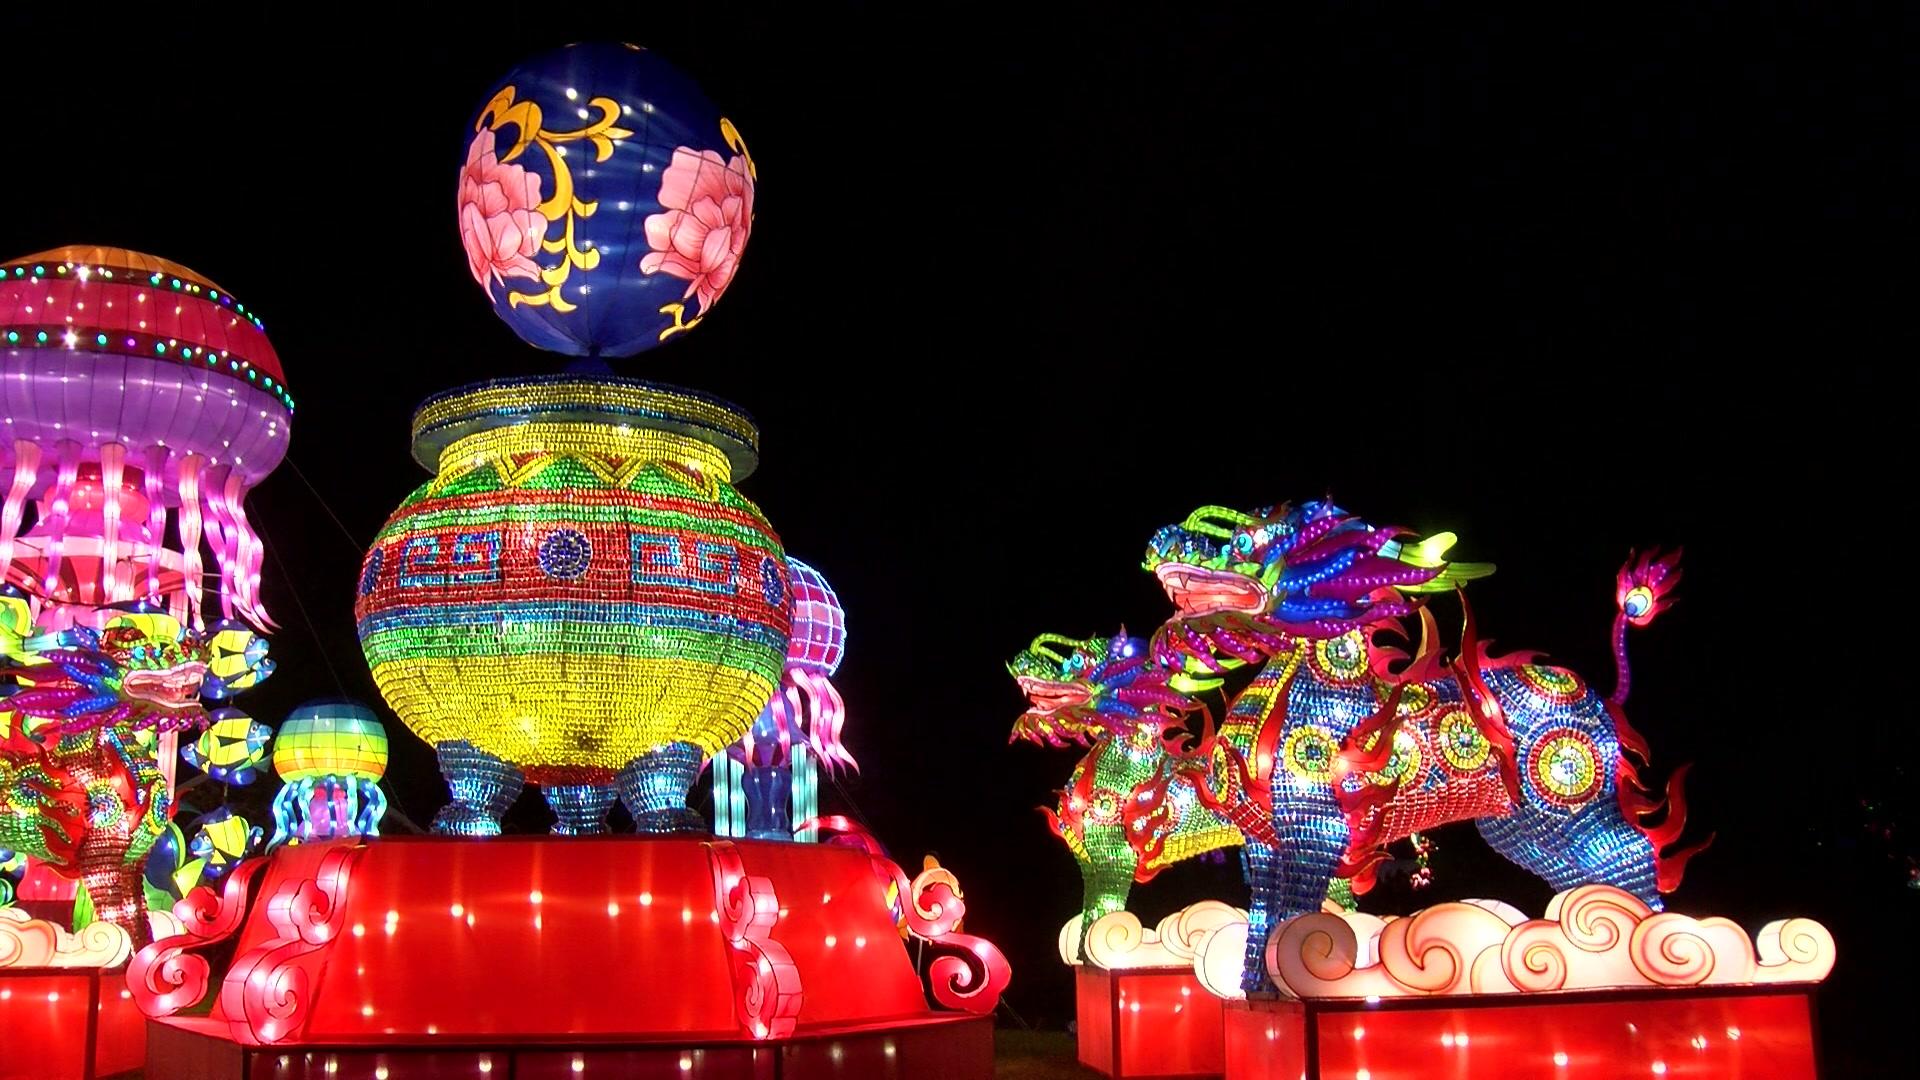 China Lights Lantern Festival Extended Through Oct 28 At Boerner Botanical Gardens